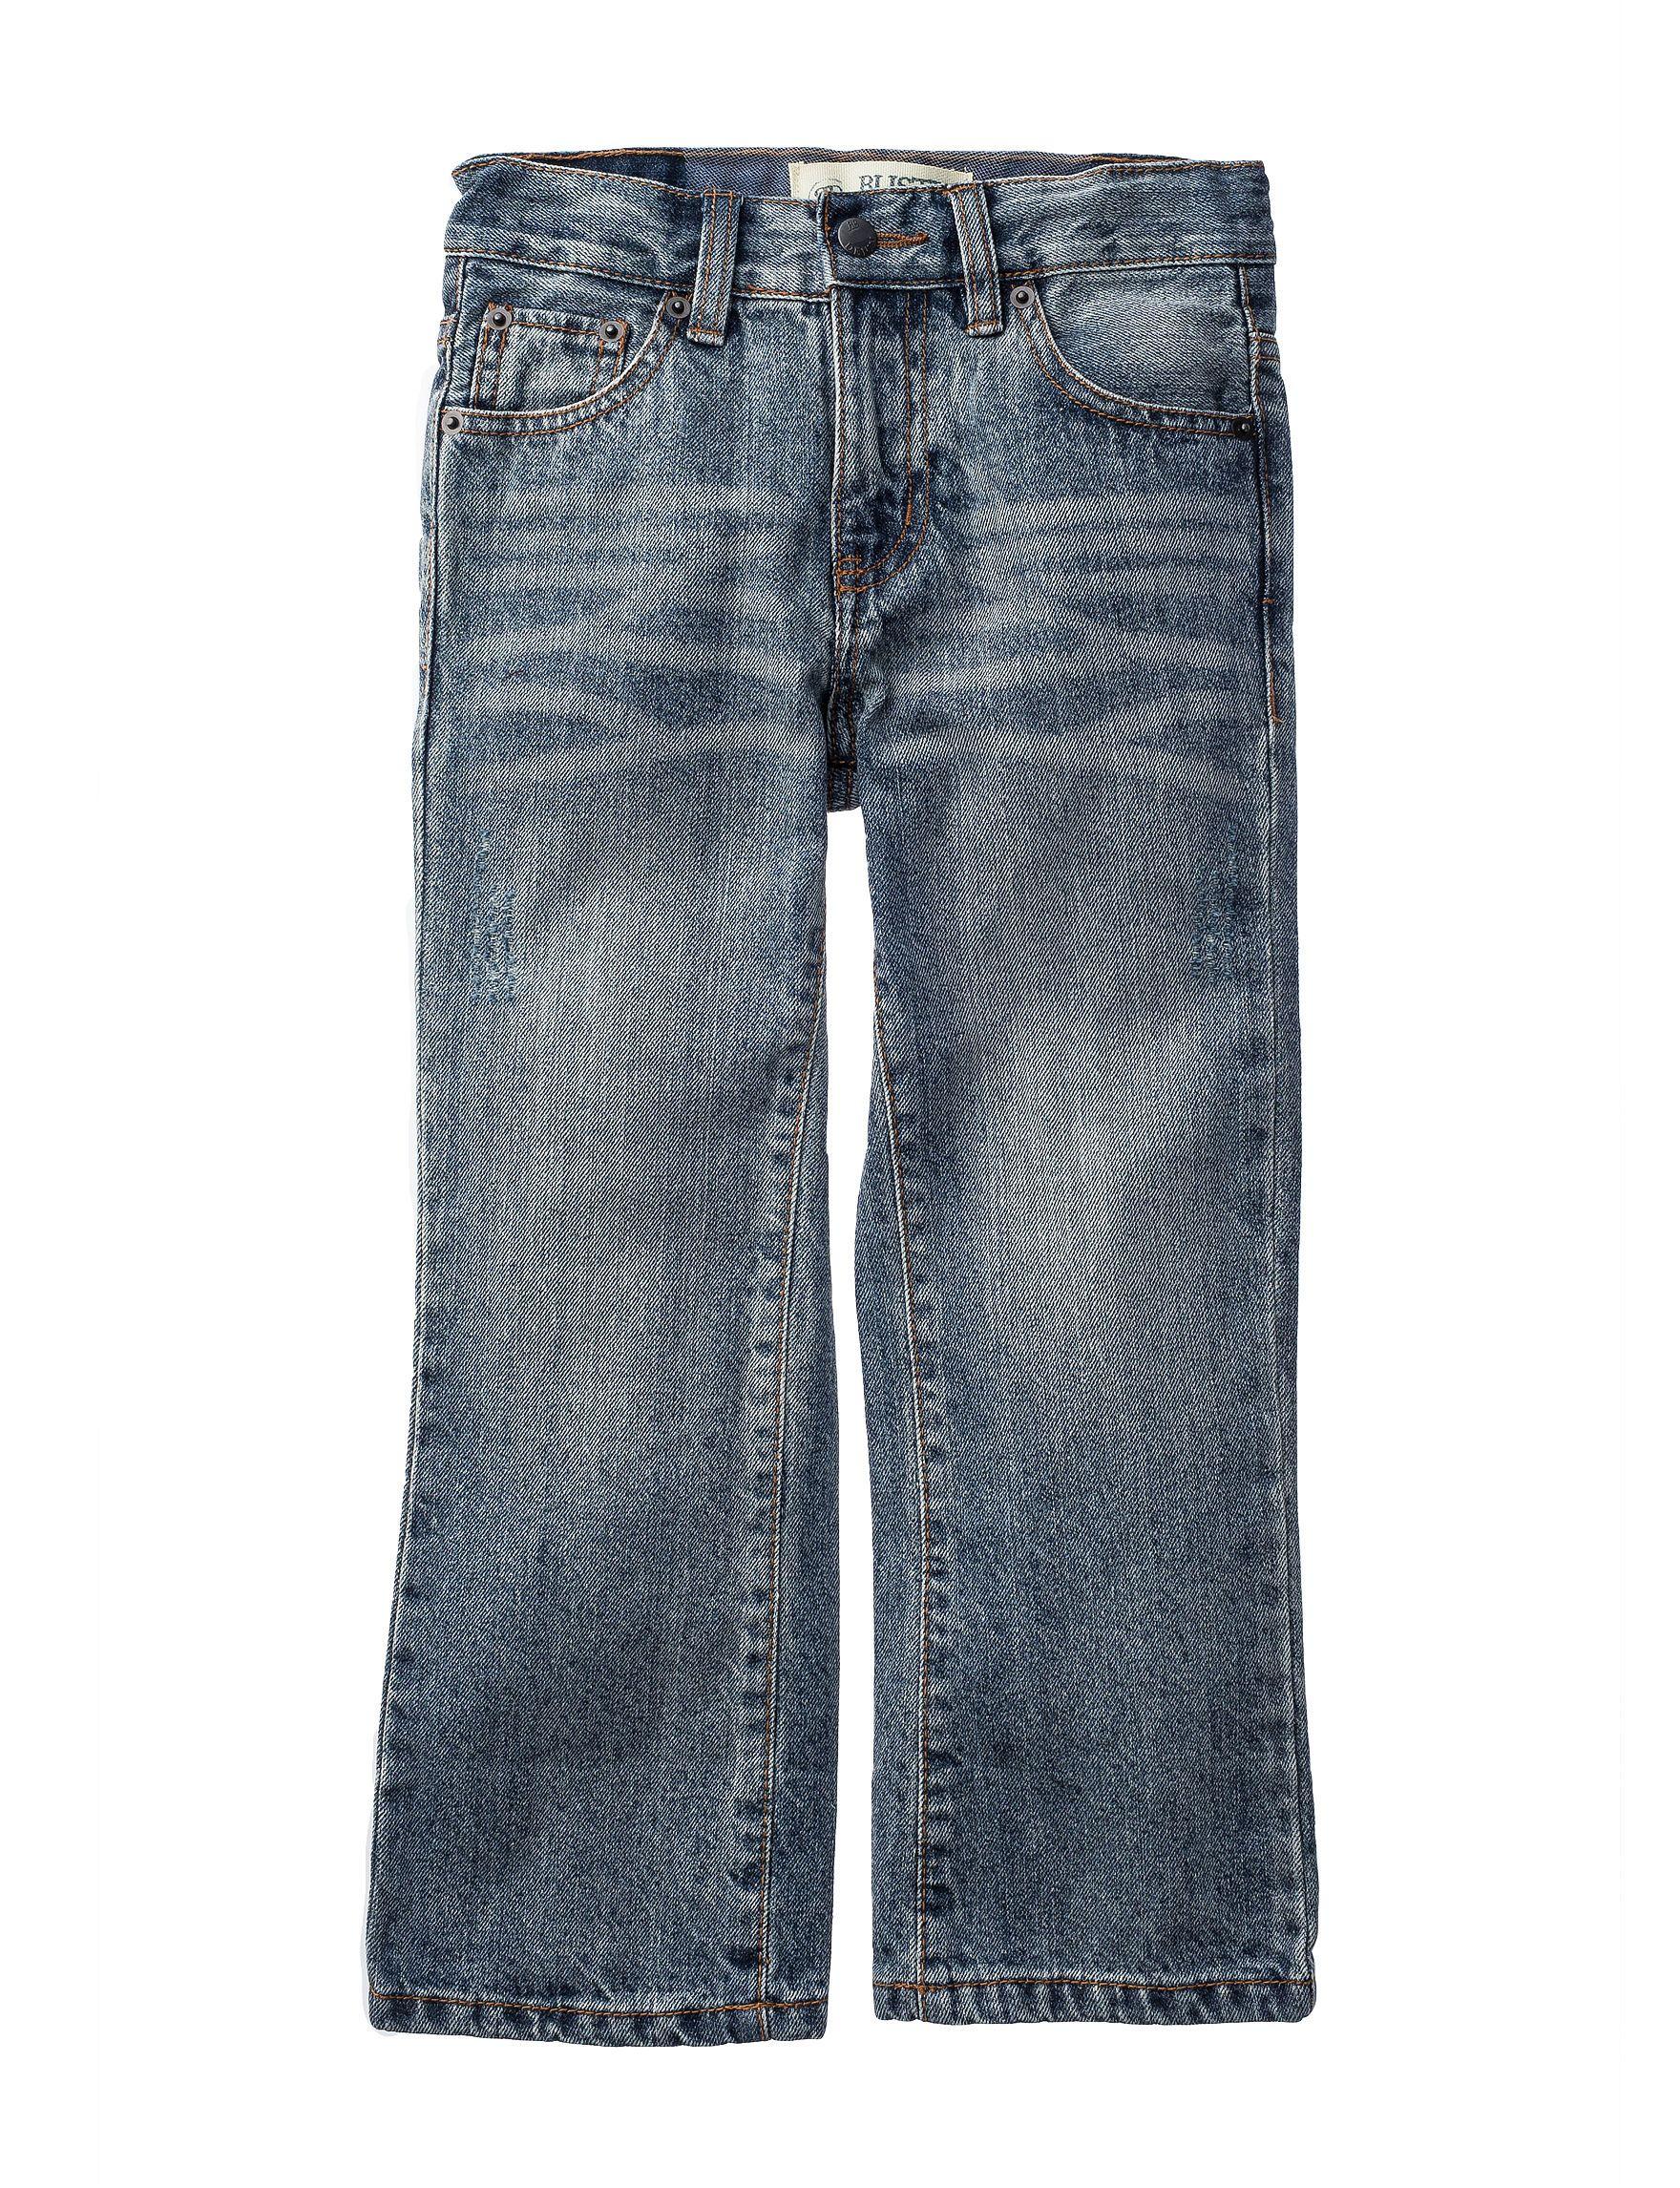 Rustic Blue Light Vintage Tint Bootcut Jeans Toddlers Boys 4 7 Rustic Blue Bootcut Jeans Toddler Boys